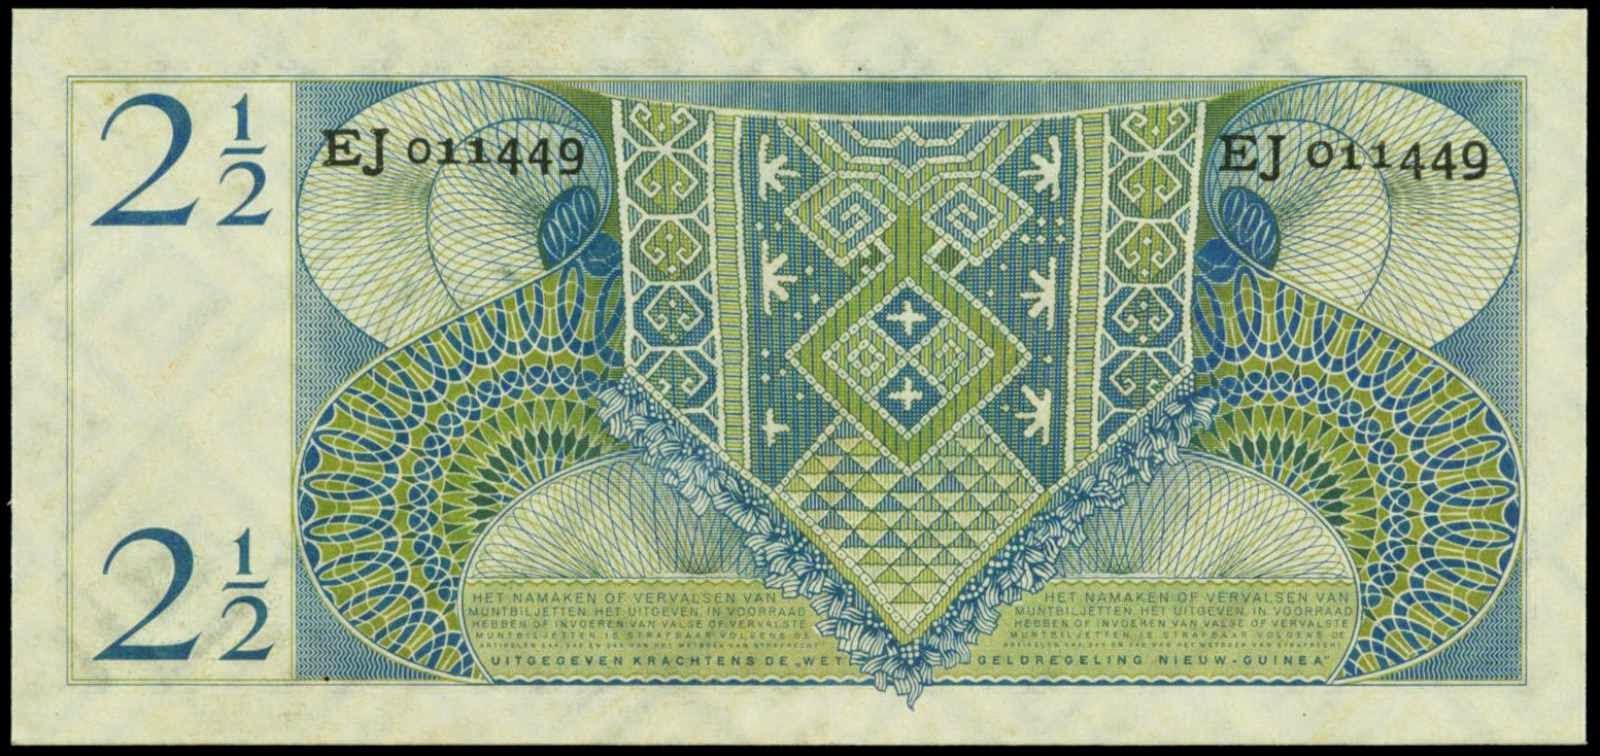 Netherlands New Guinea paper money 2 1/2 Gulden note 1954